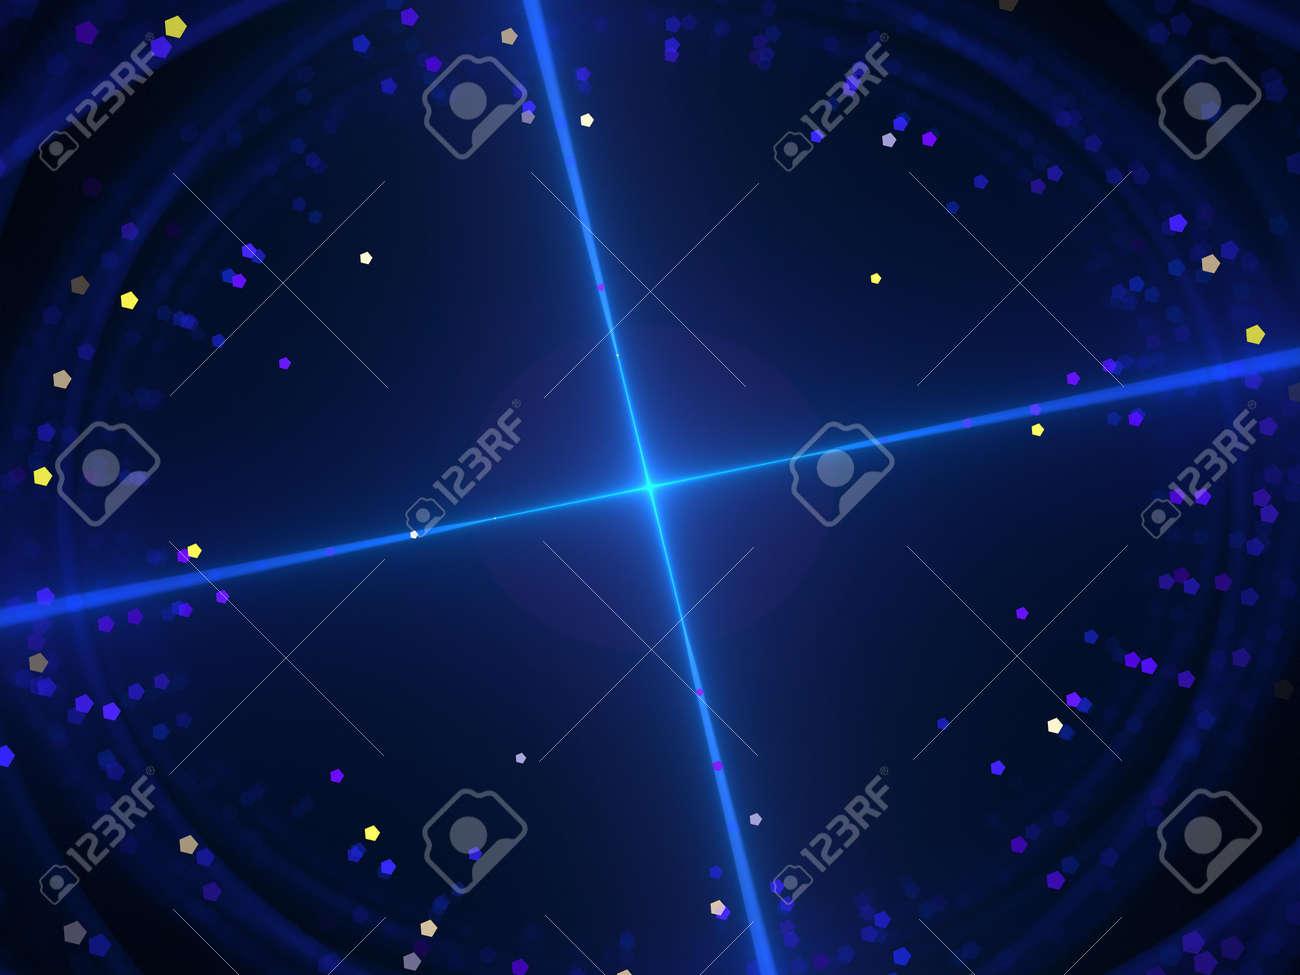 Imaginatory fractal background Image - 157031078